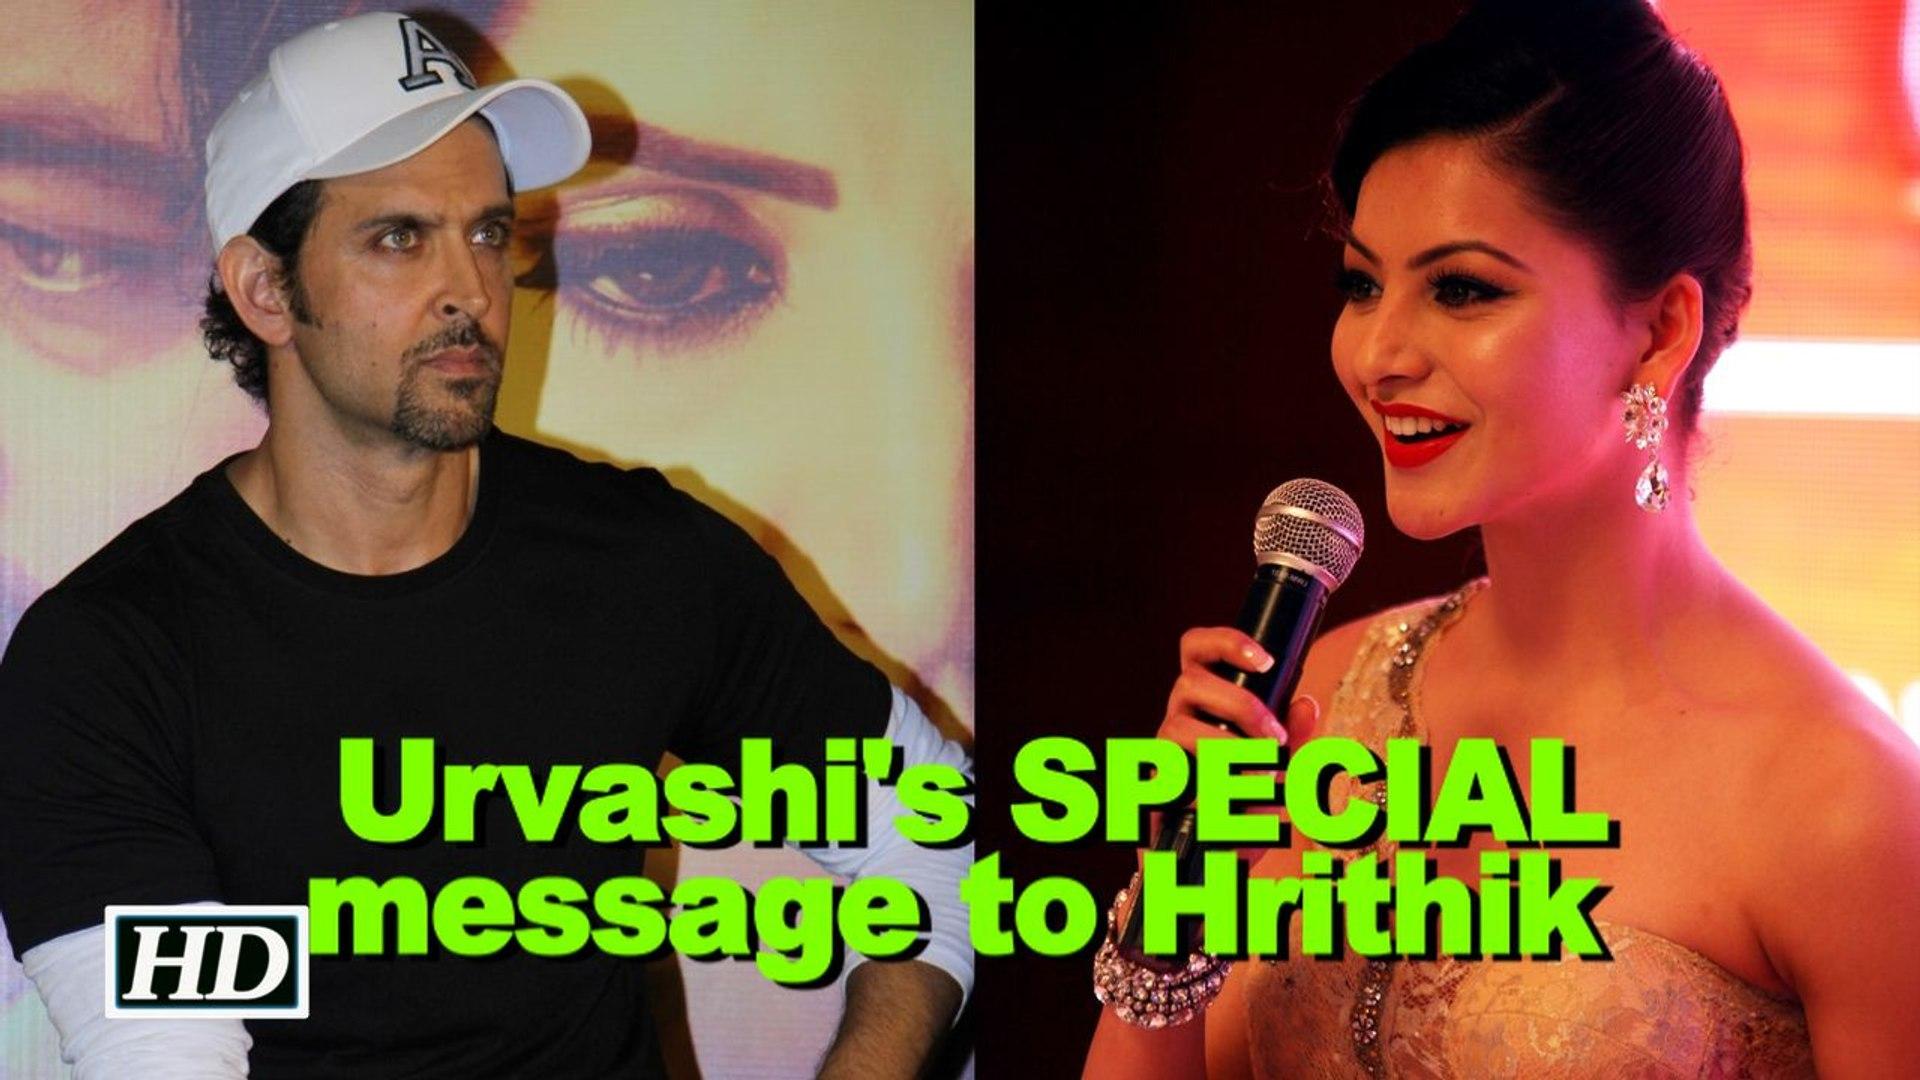 Urvashi Rautelas's SPECIAL message to Hrithik Roshan